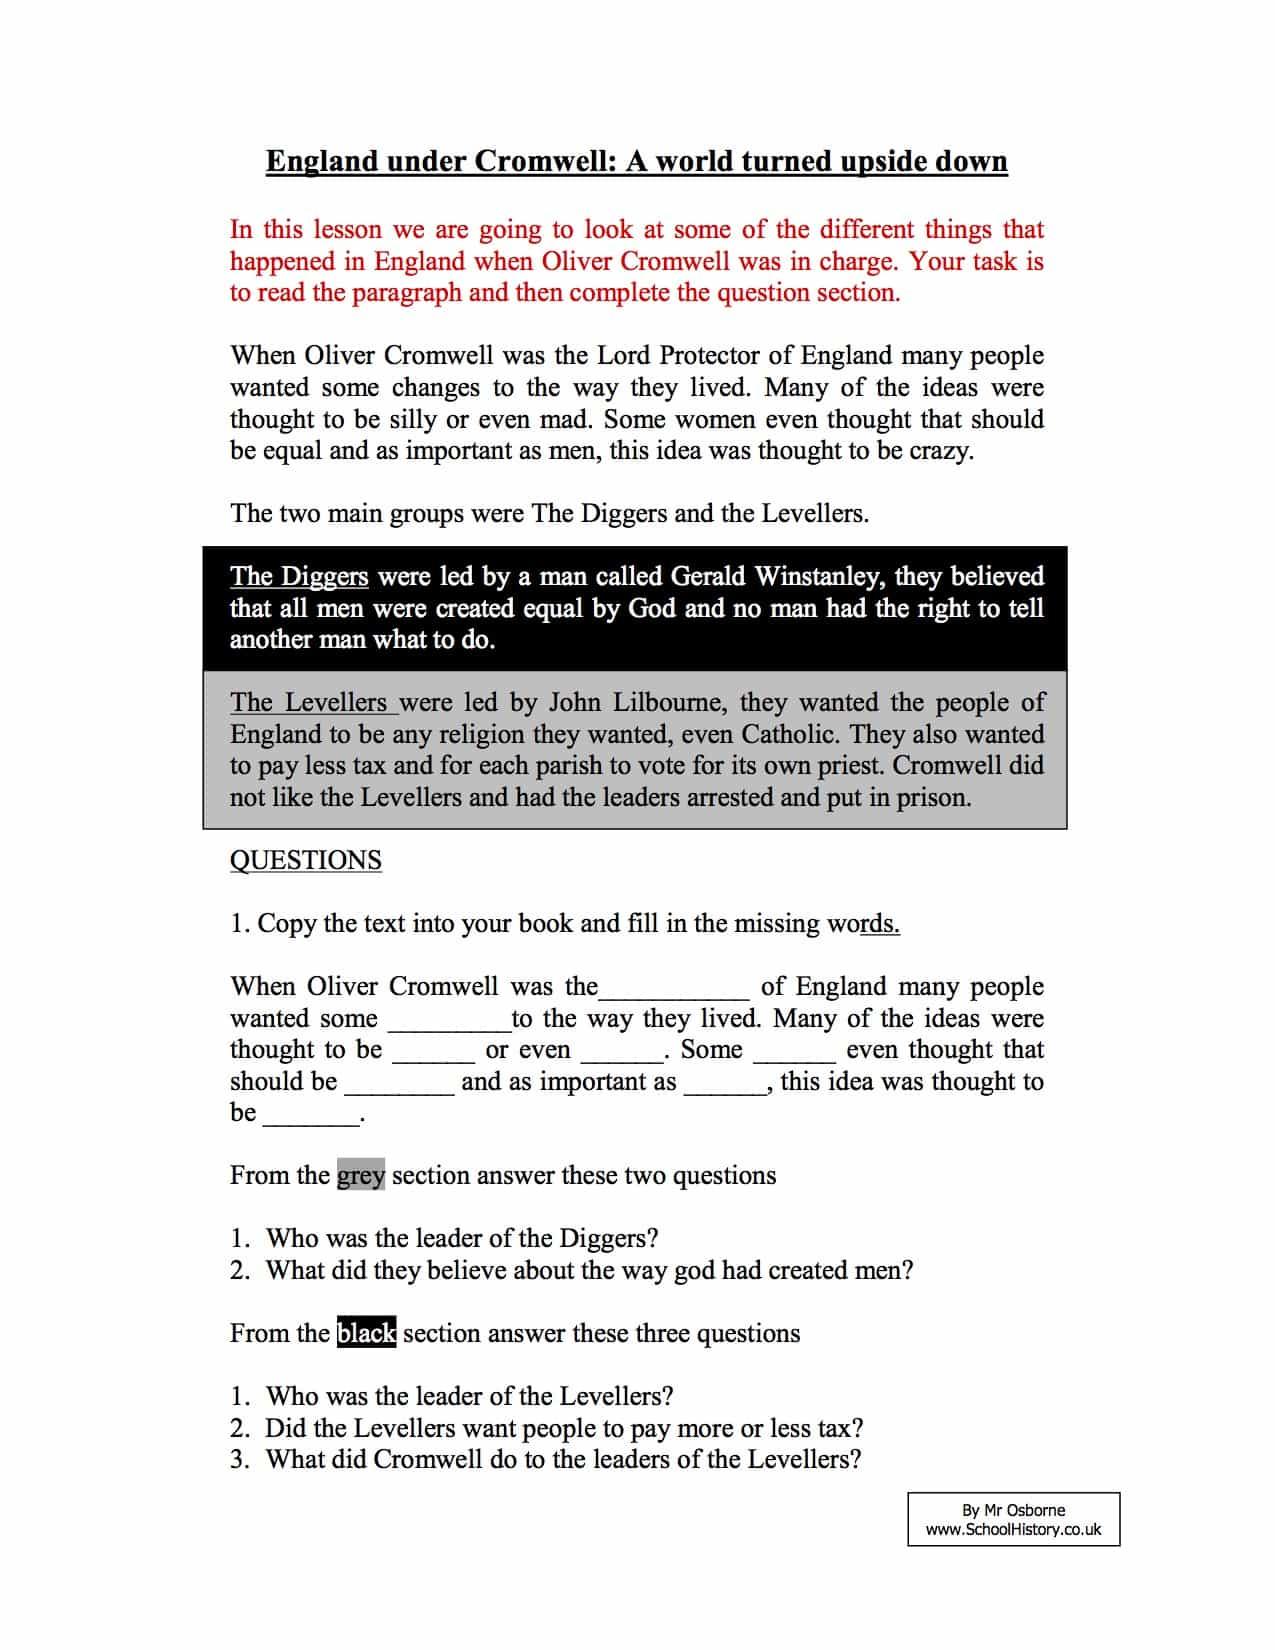 Free History Worksheets